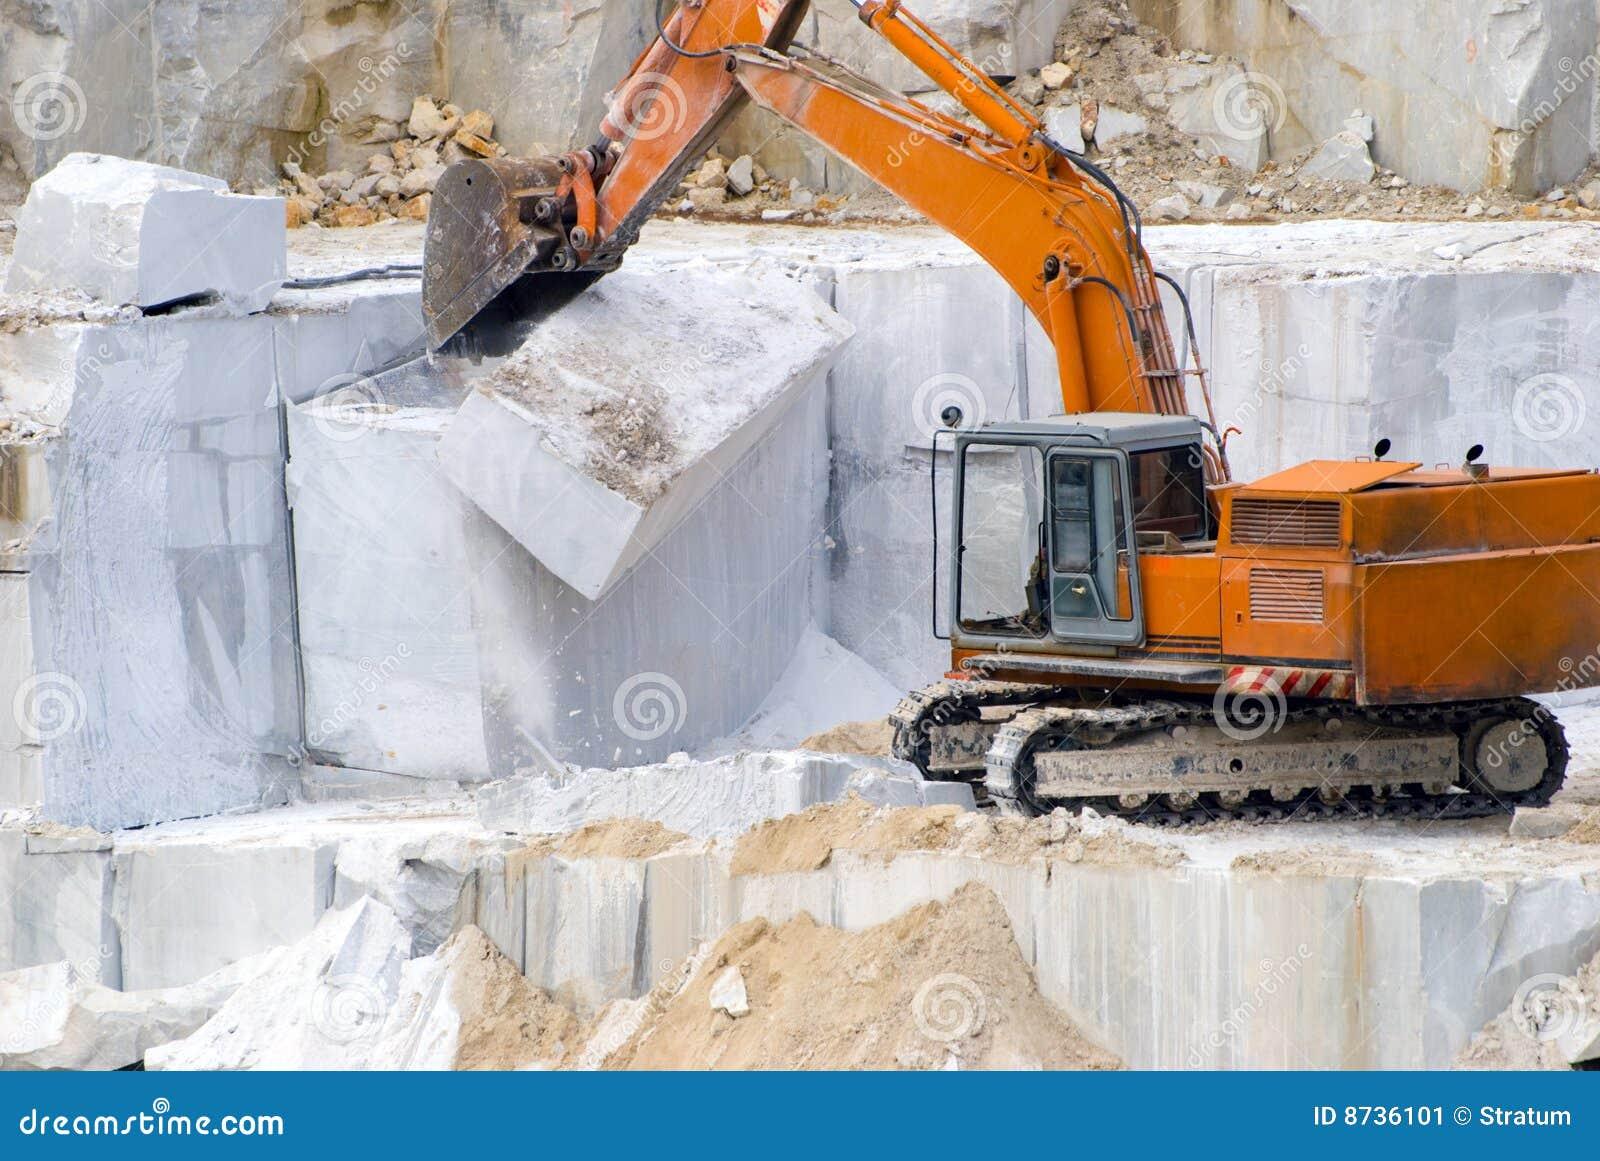 Extraktion eines Marmors